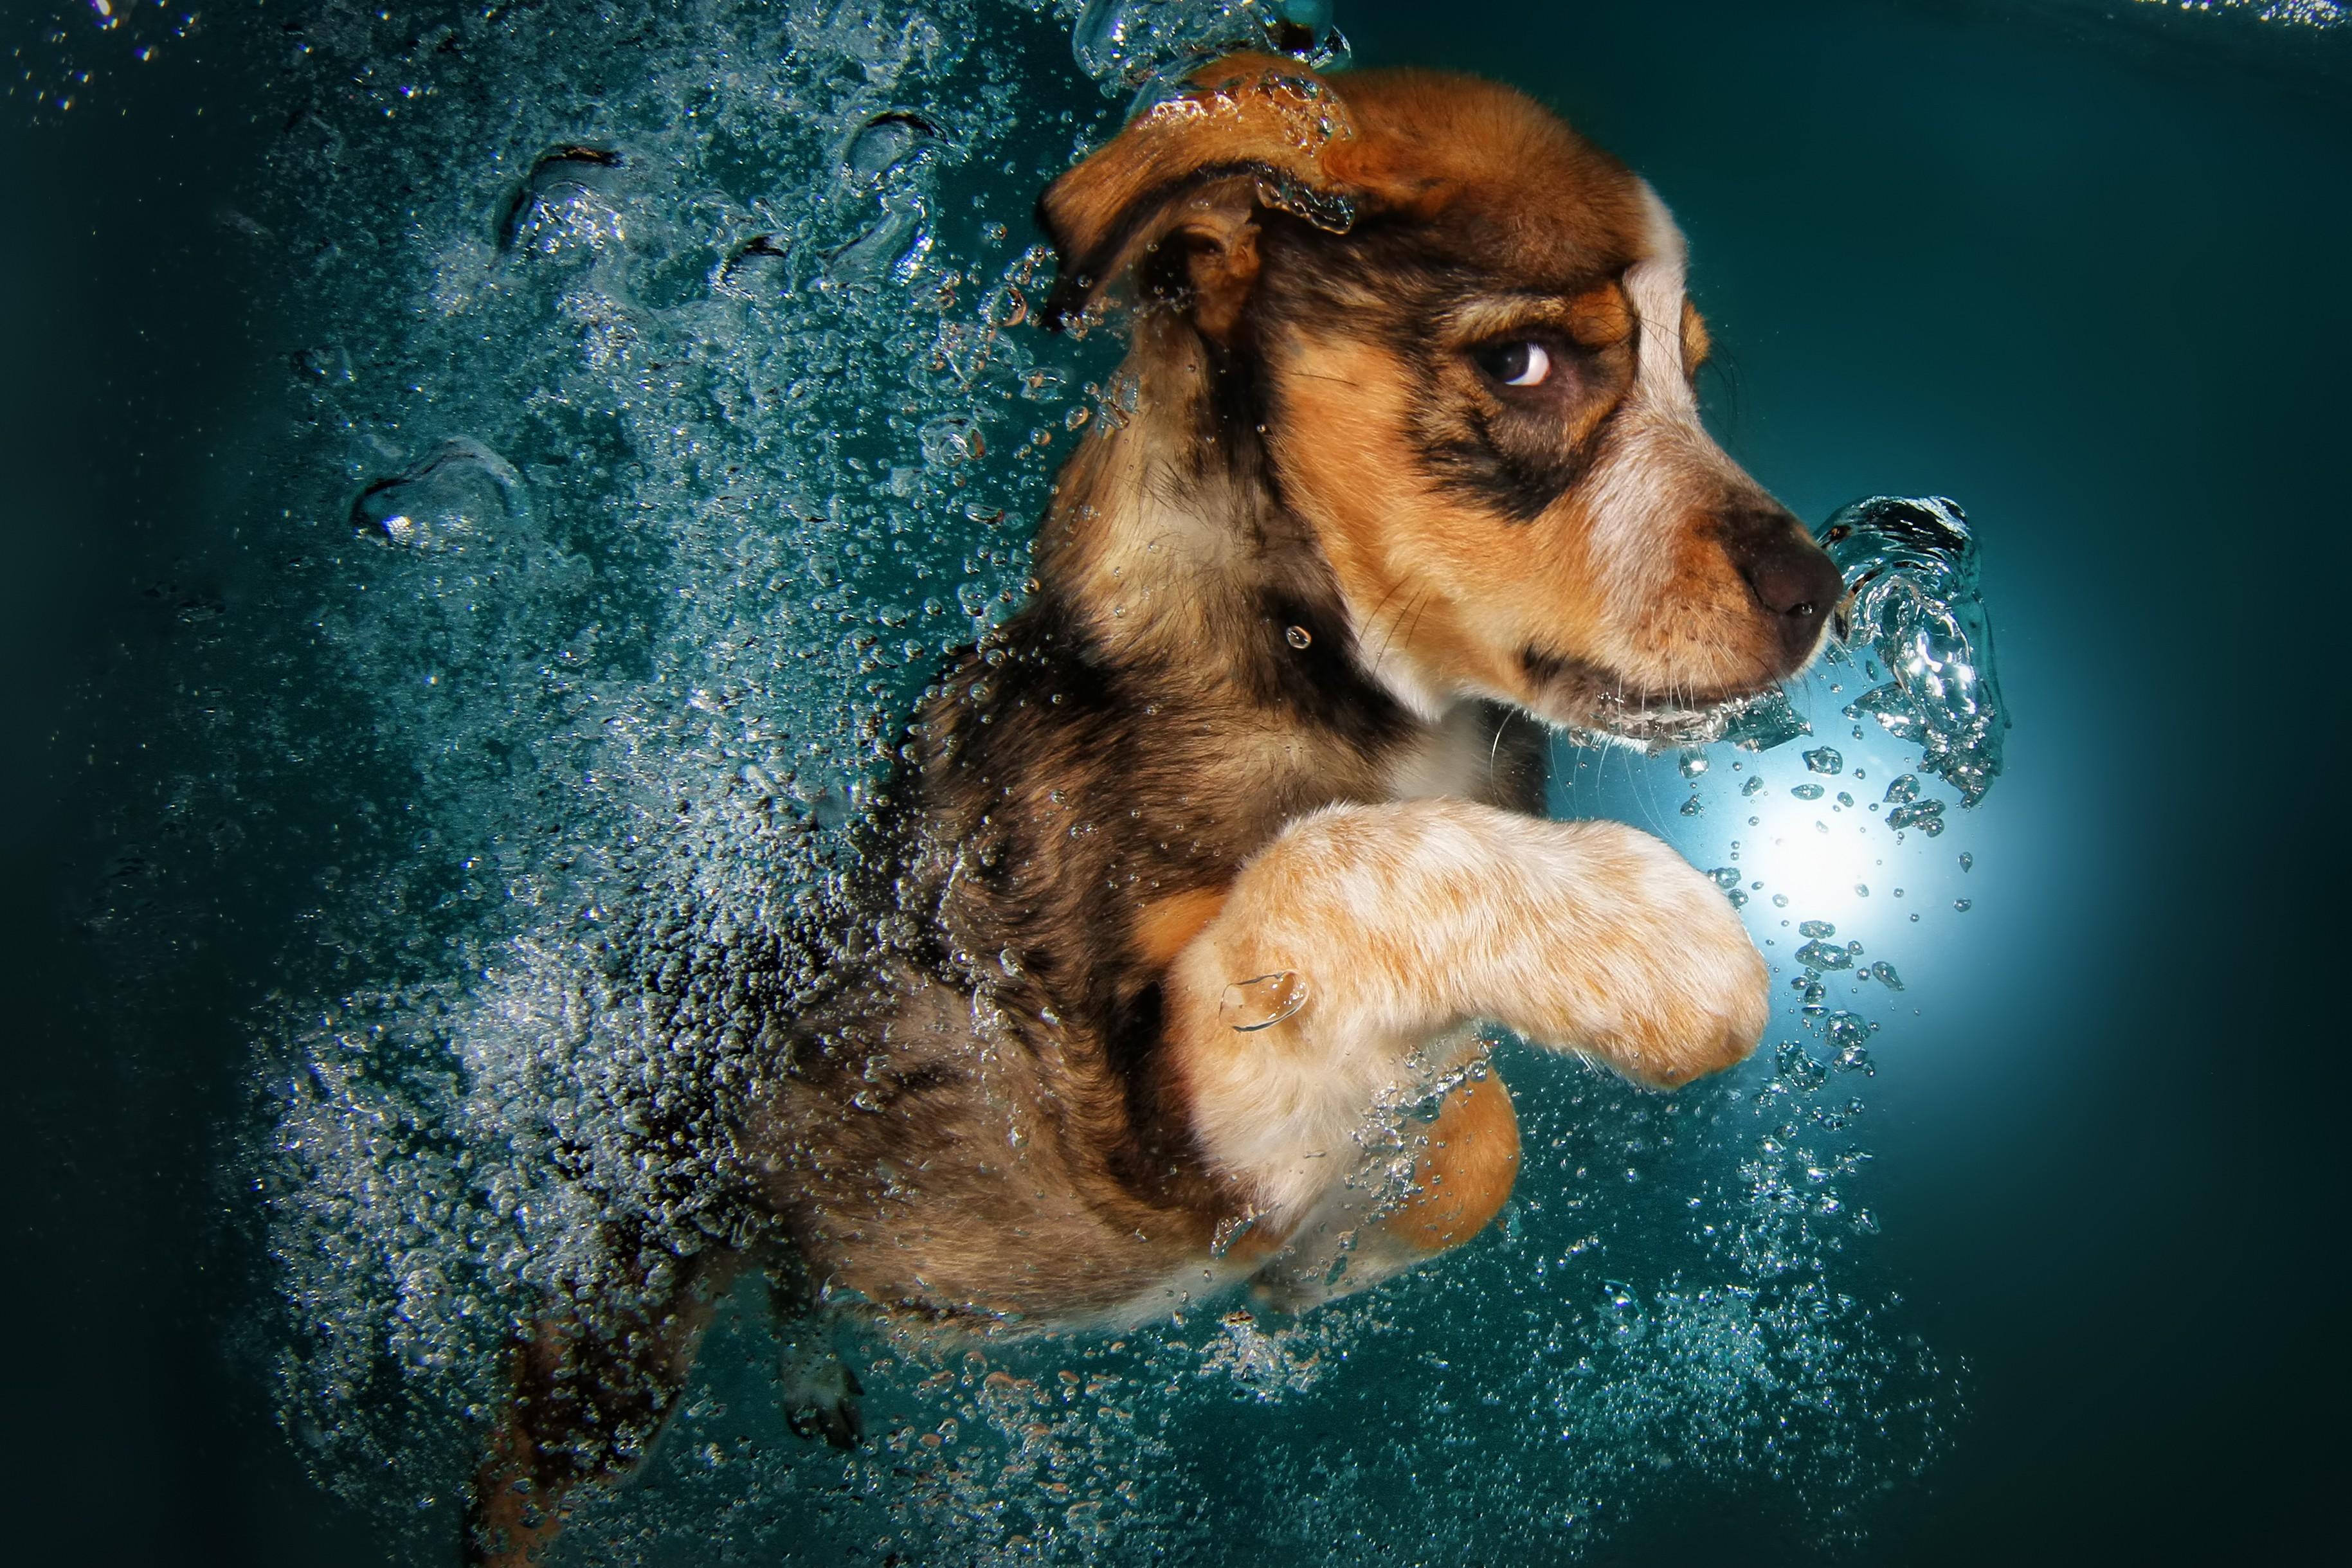 ... , Animals / Pets: Border Collie, dog, underwater, cute animals, funny